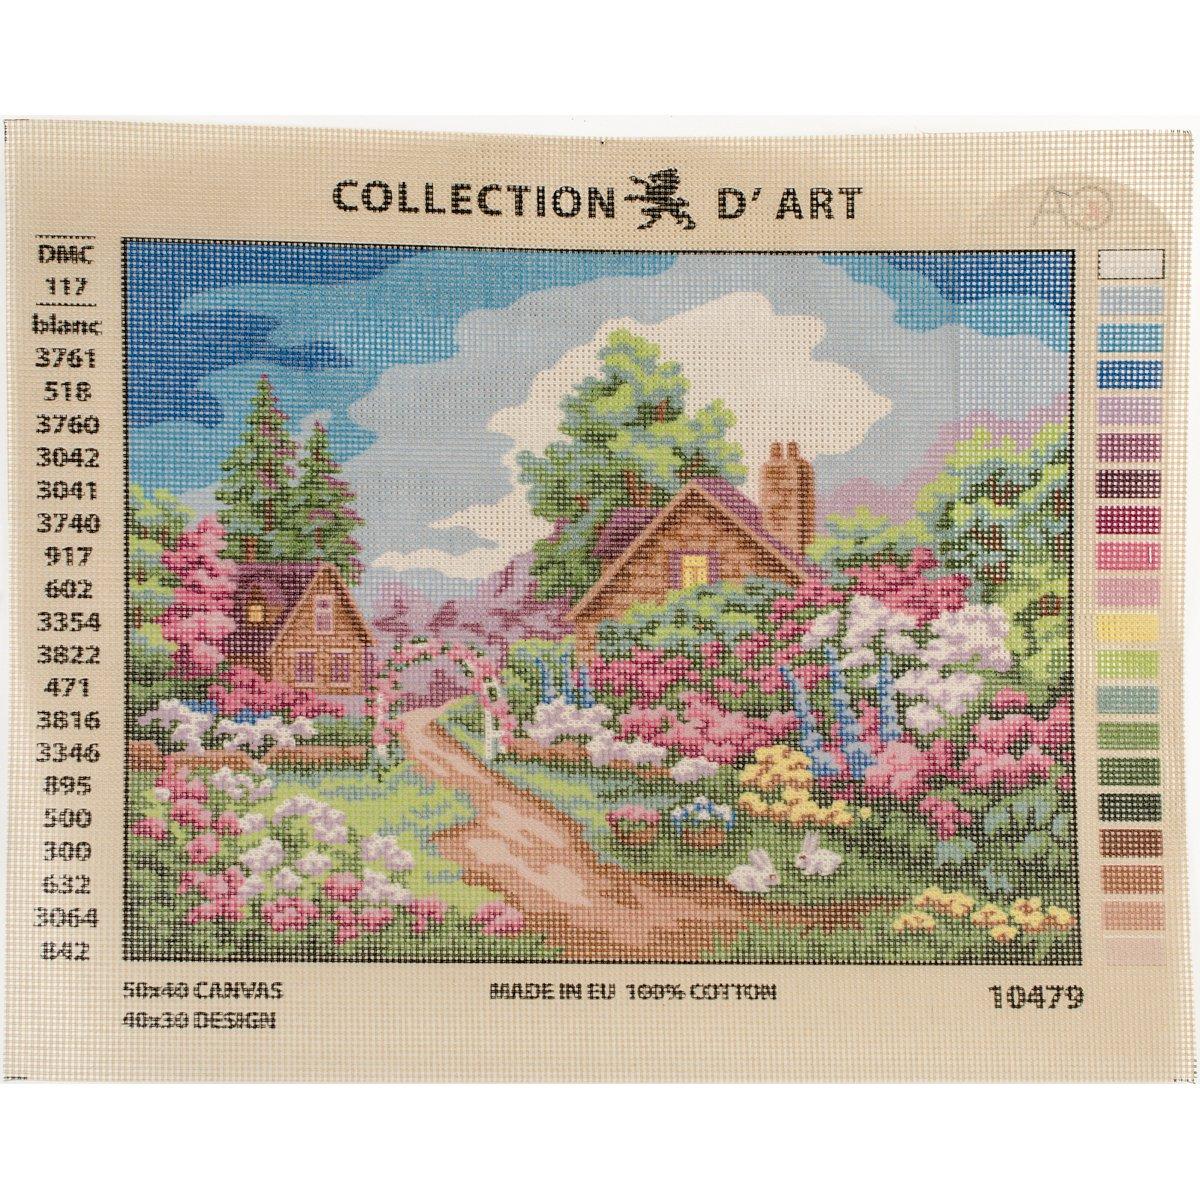 40 x 50cm RTOFlower Gate DArt Needlepoint Printed Tapestry Canvas